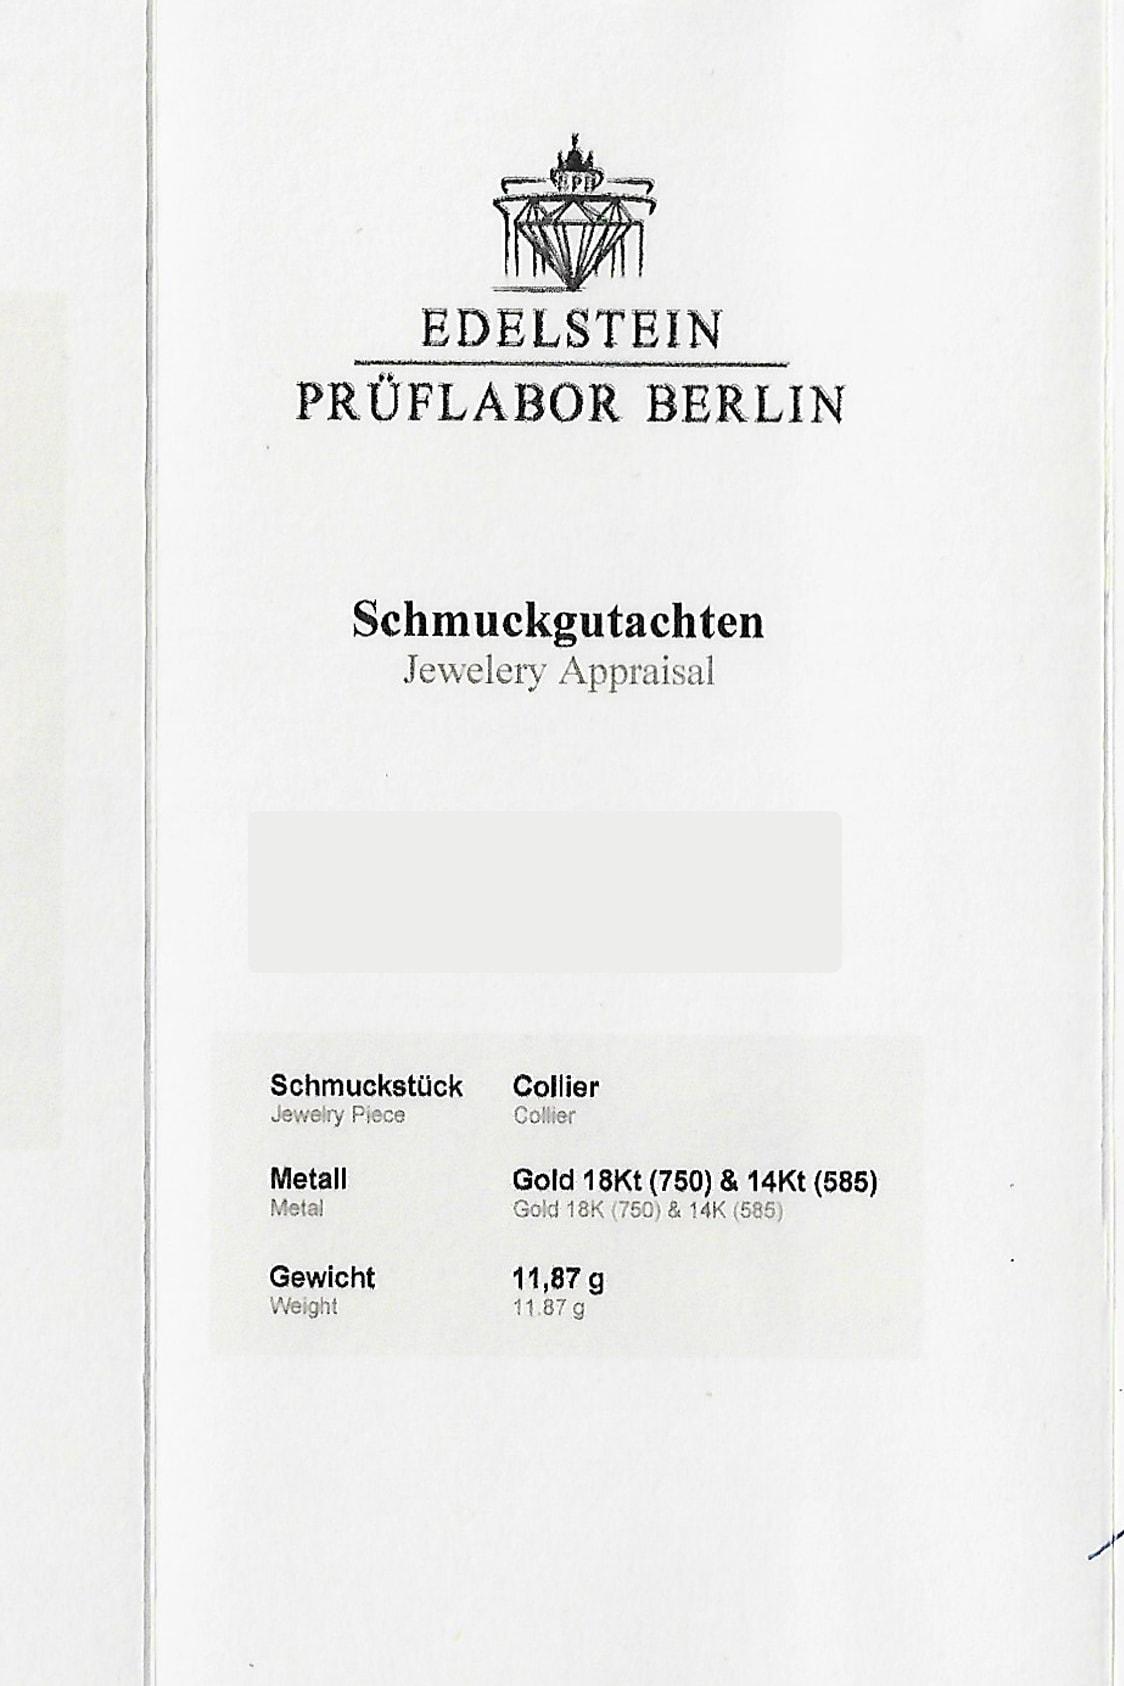 antikschmuck-collier-0570a